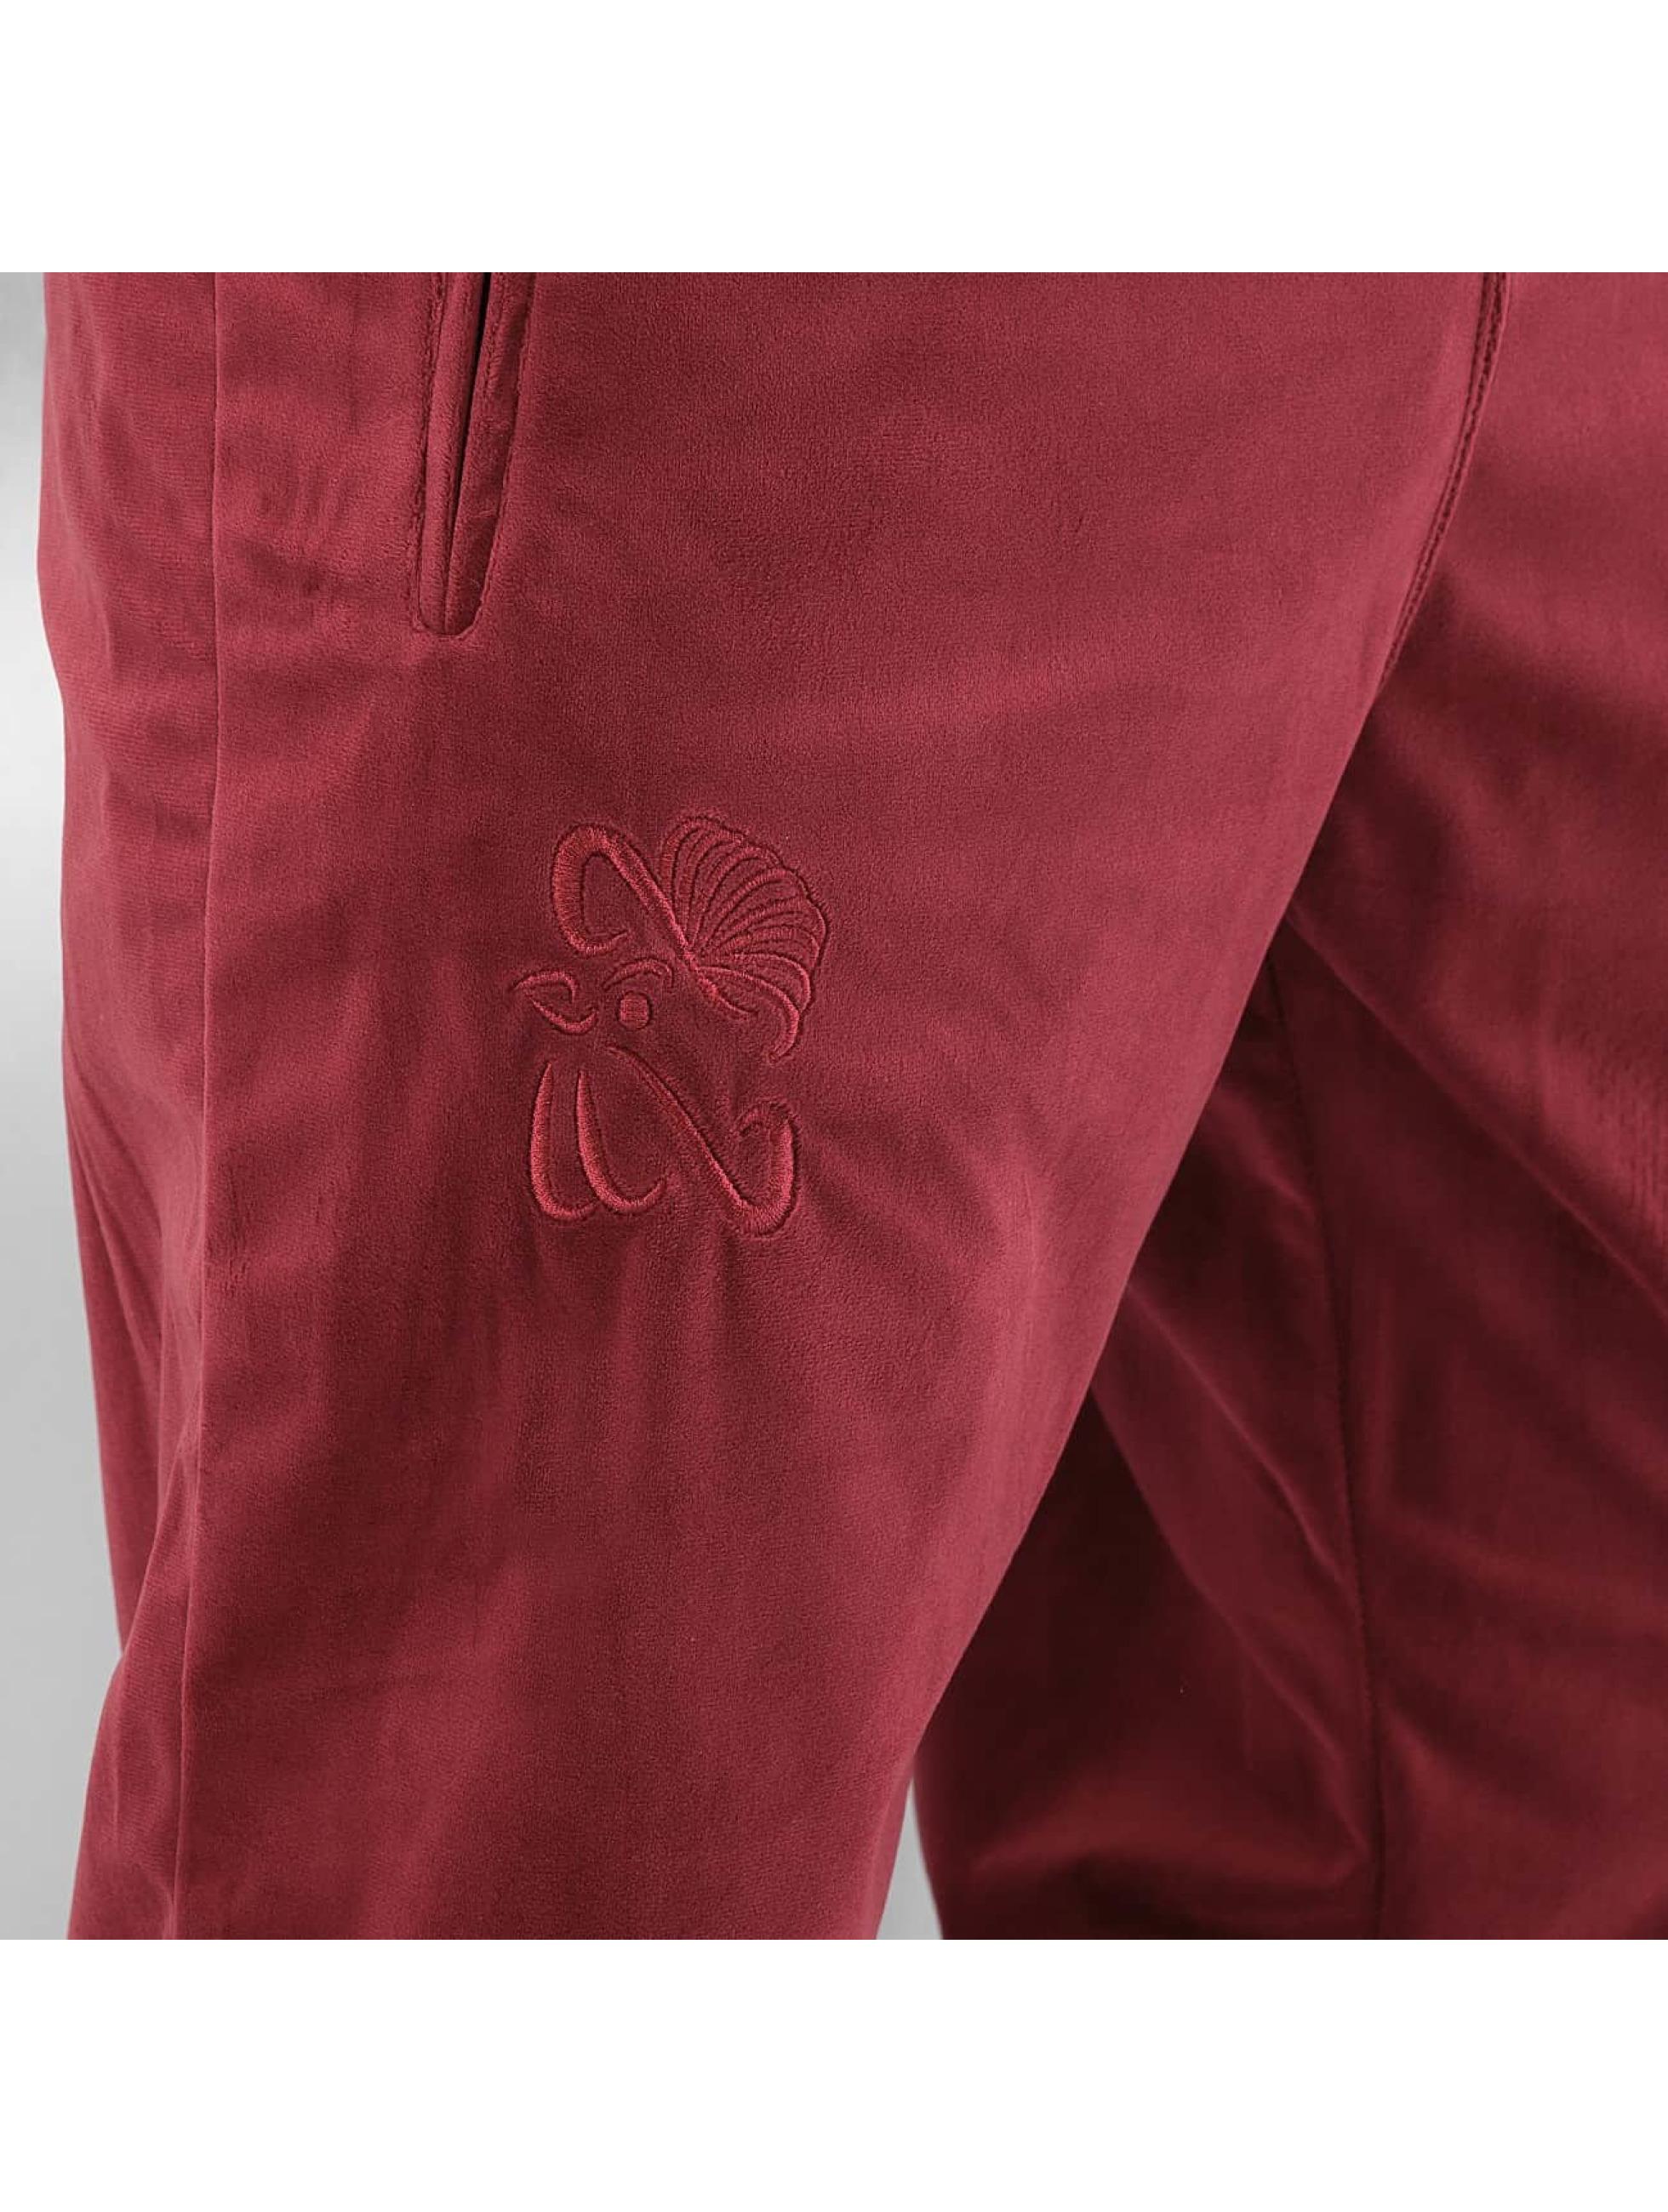 CHABOS IIVII Спортивные брюки Core Velour Samt красный